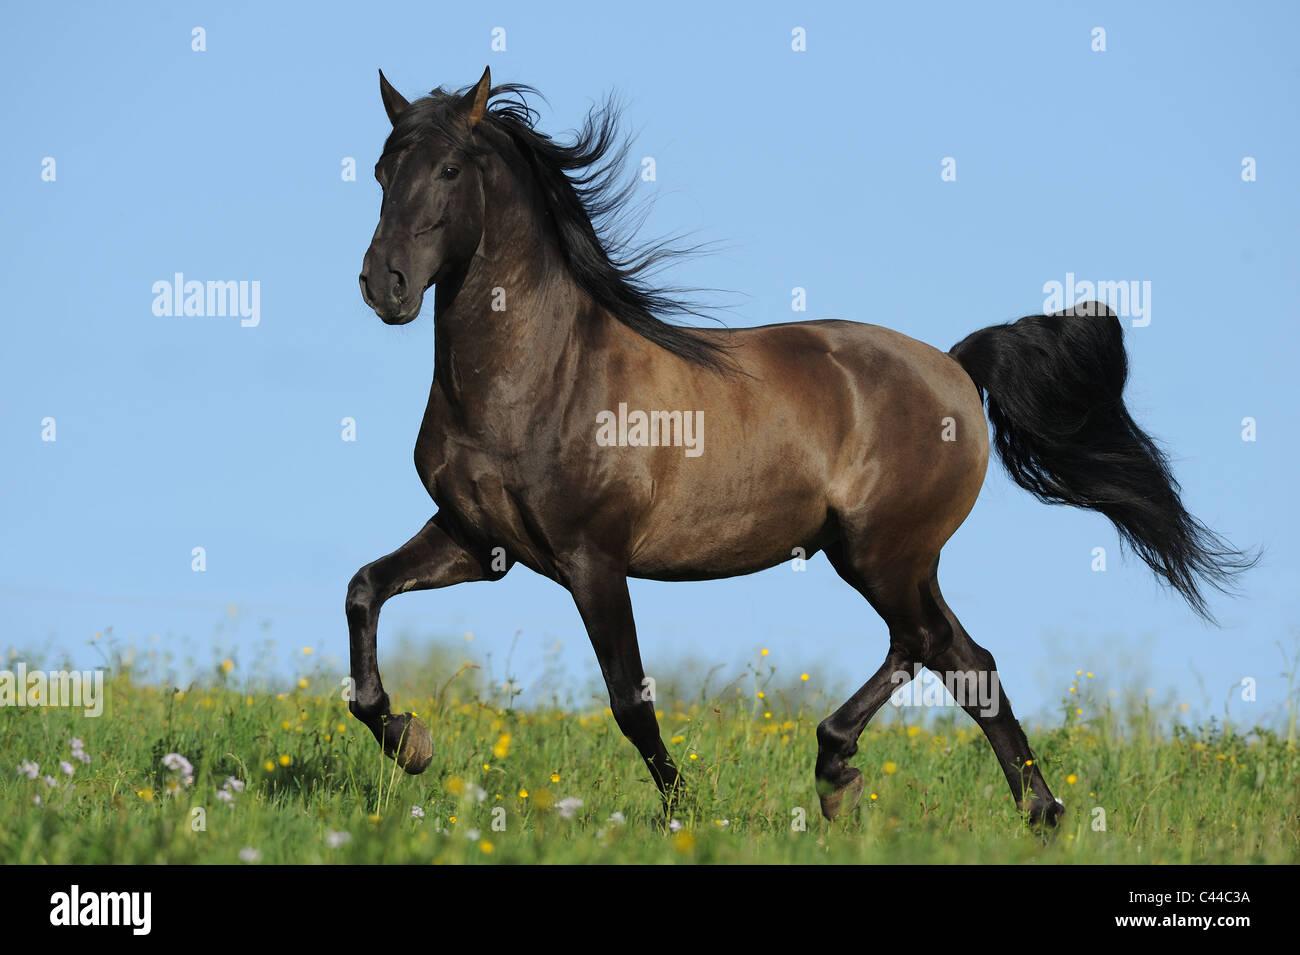 Lusitano (Equus ferus caballus), stallion at a trot on a meadow. - Stock Image